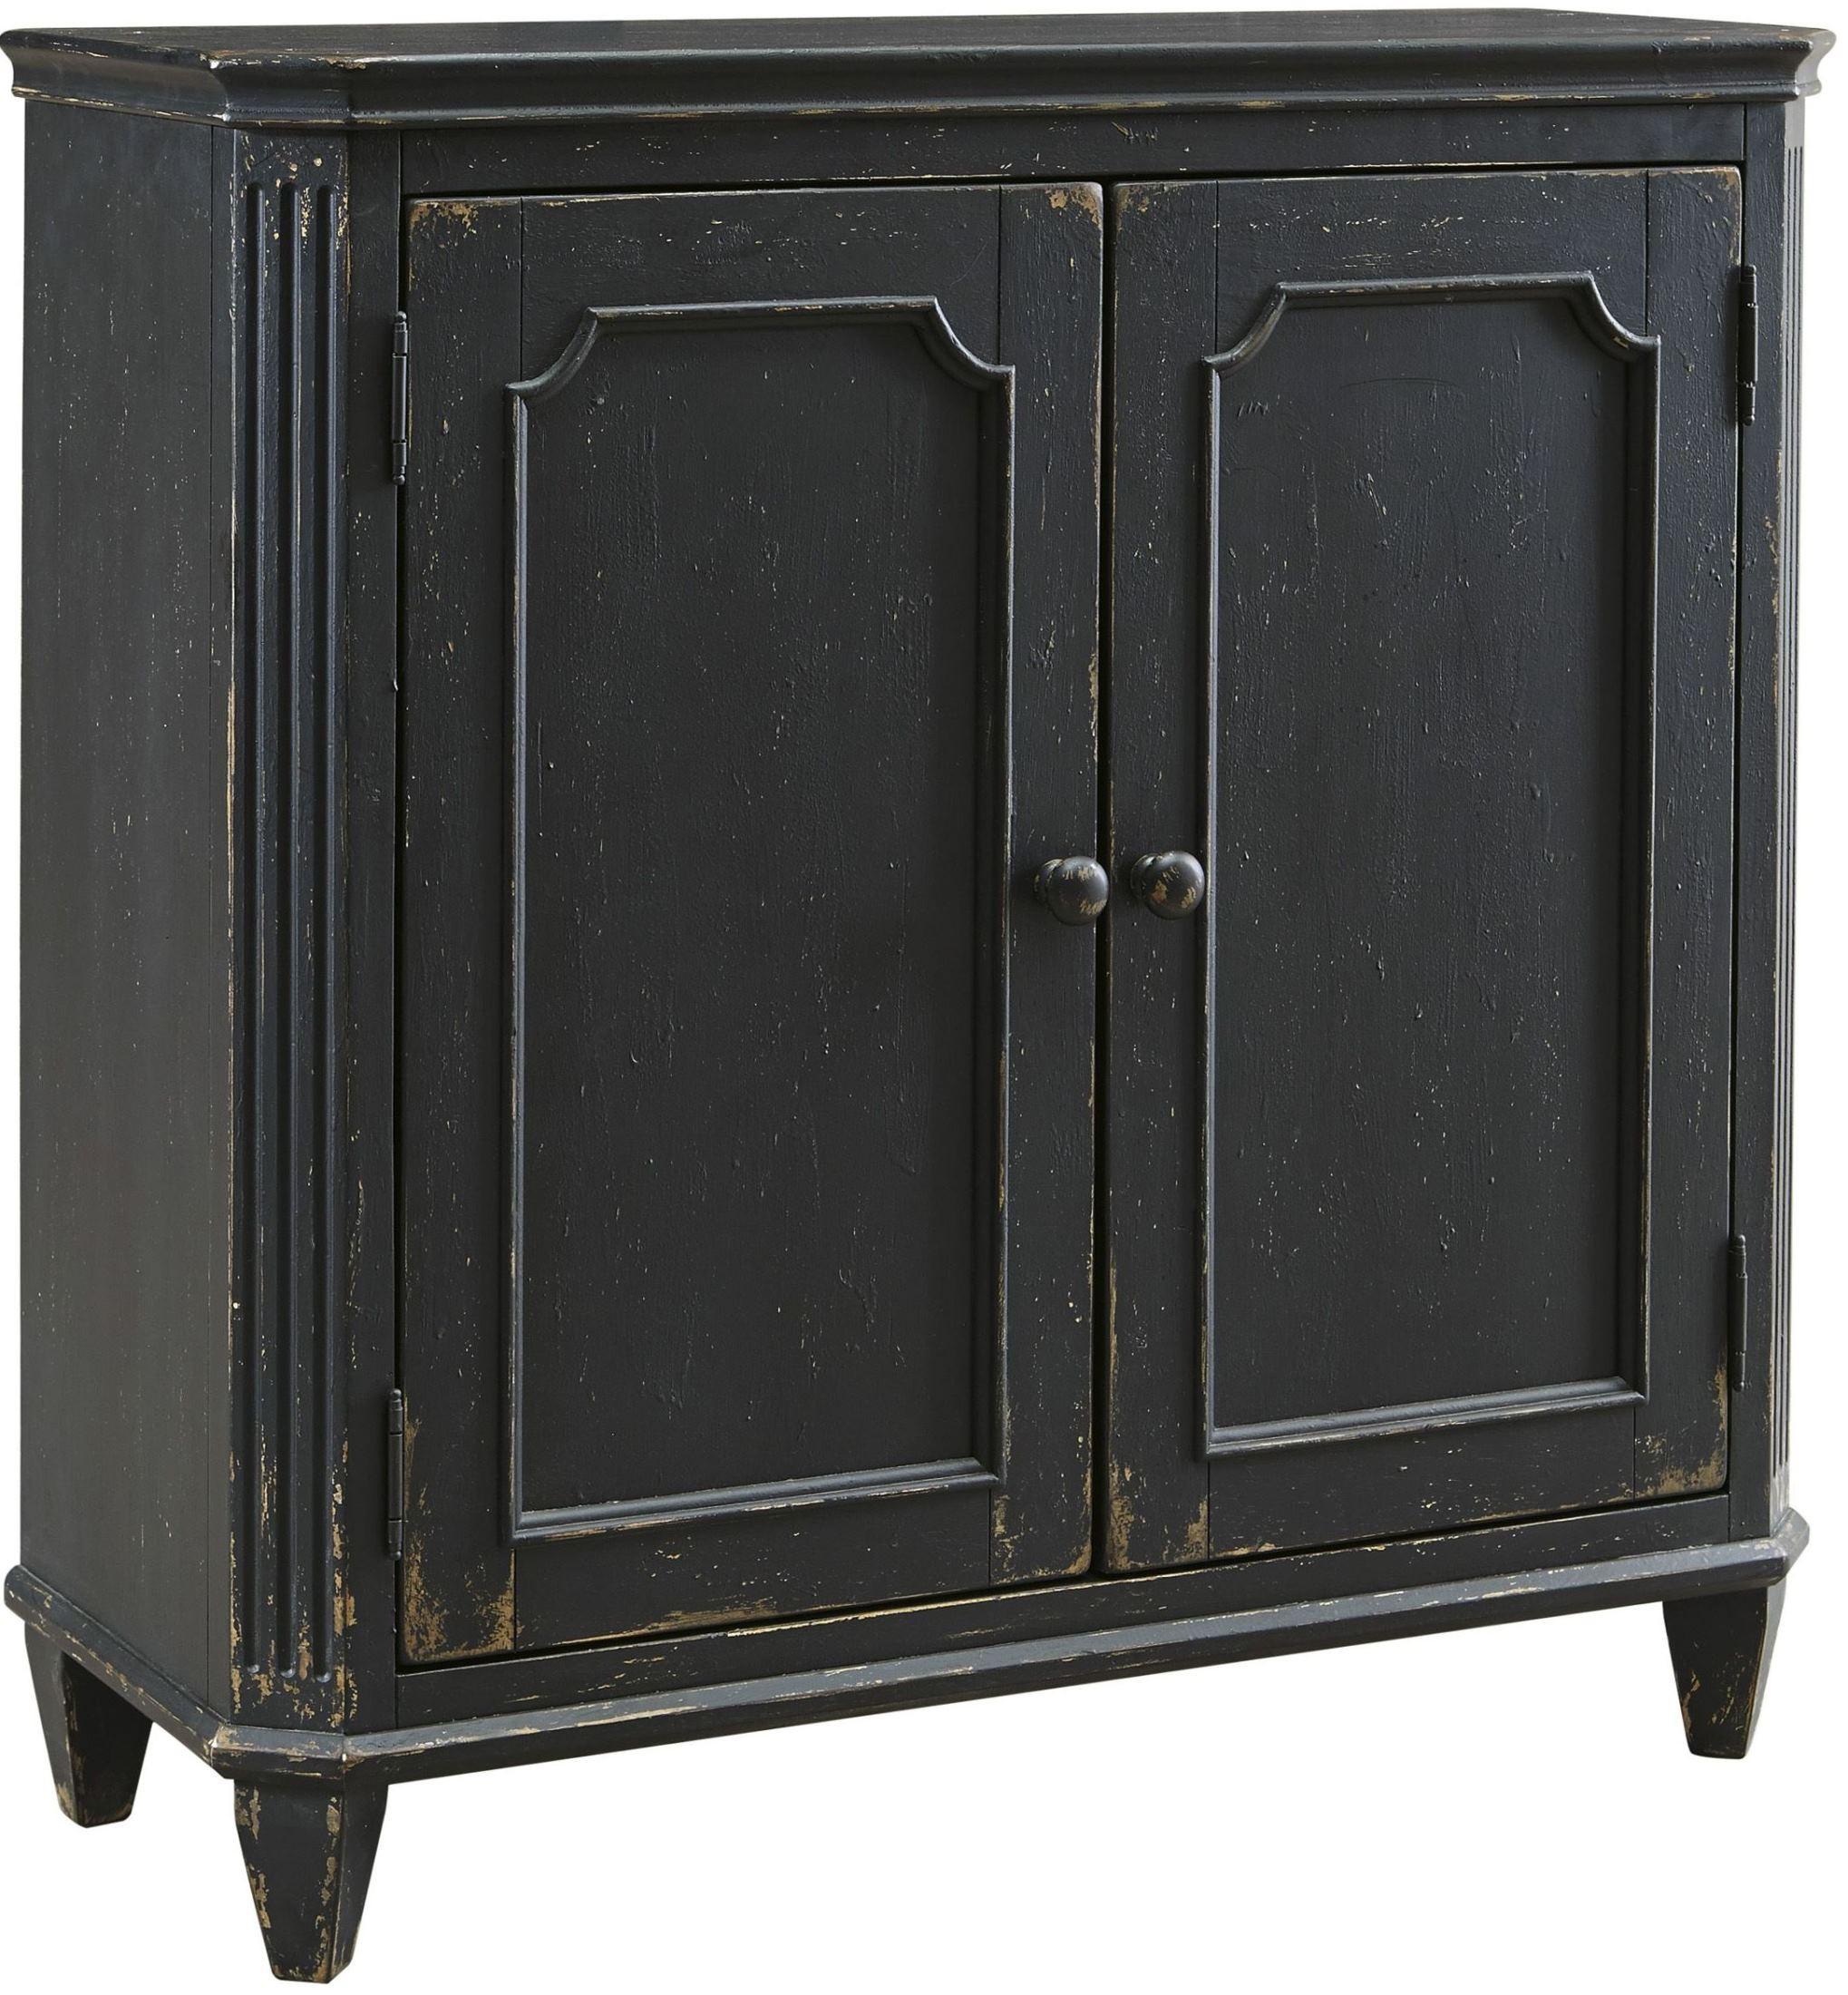 Mirimyn antique black door accent cabinet t505 840 ashley for Black cabinet with doors